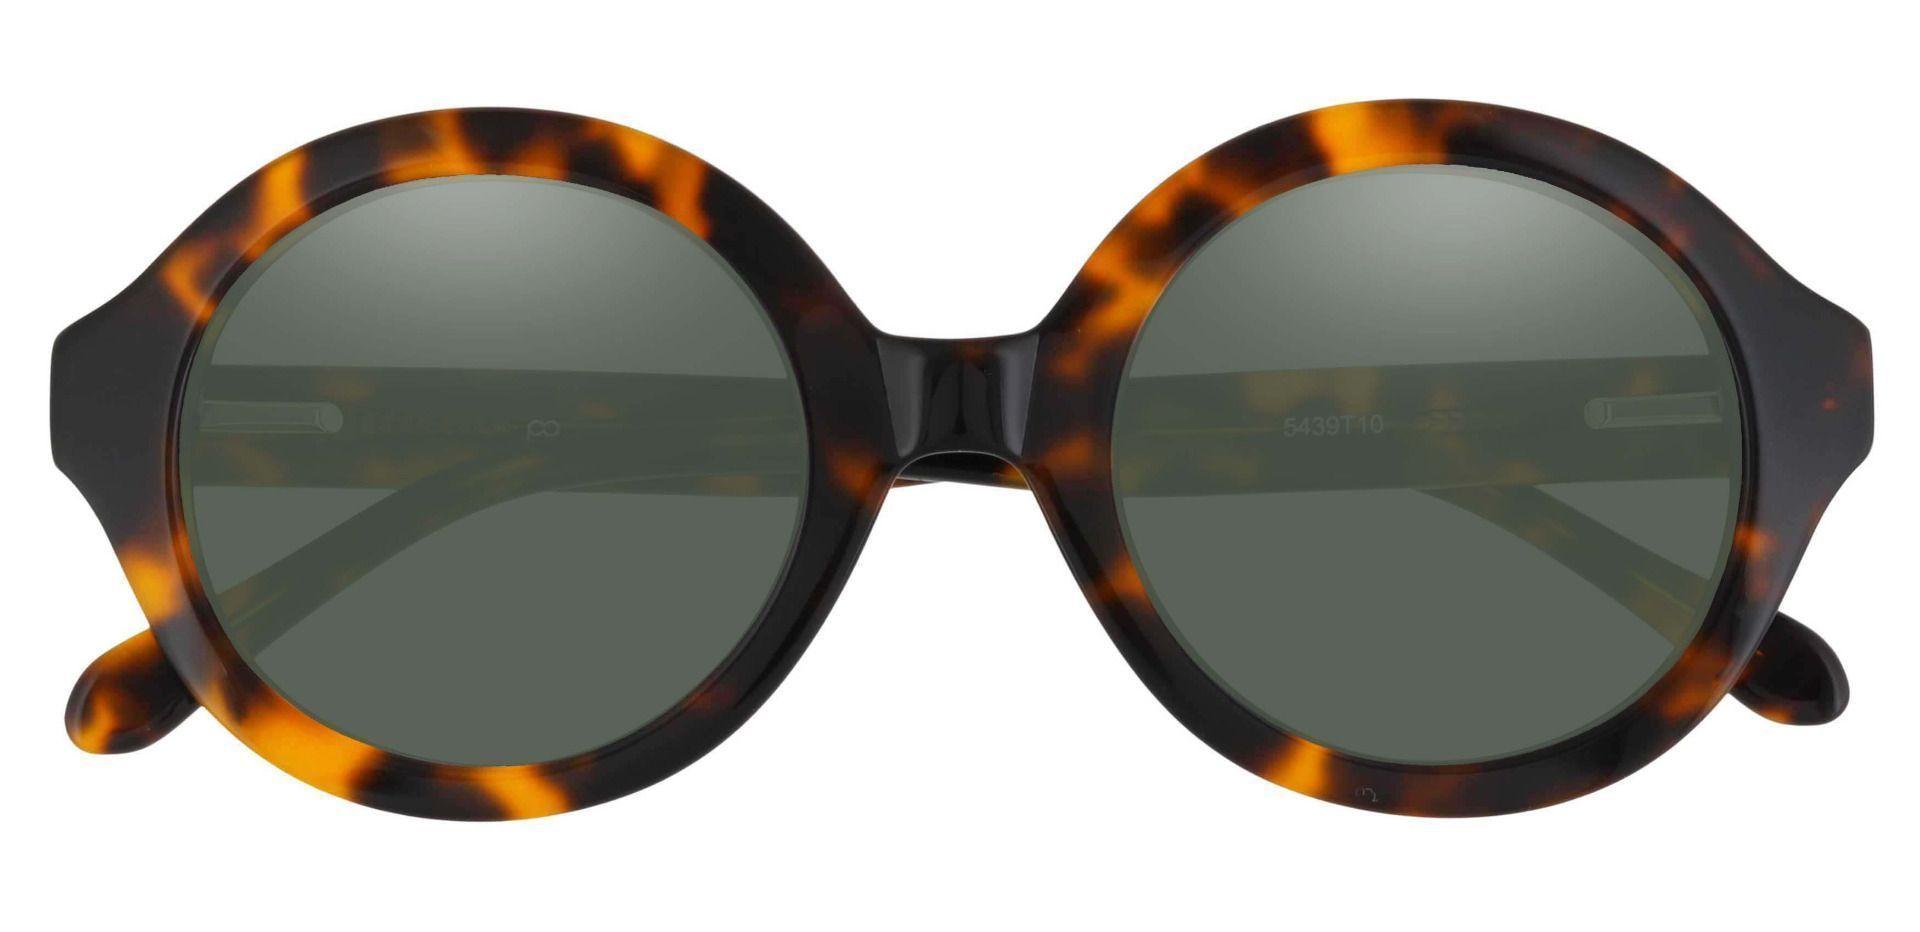 Clara Round Prescription Sunglasses - Tortoise Frame With Green Lenses